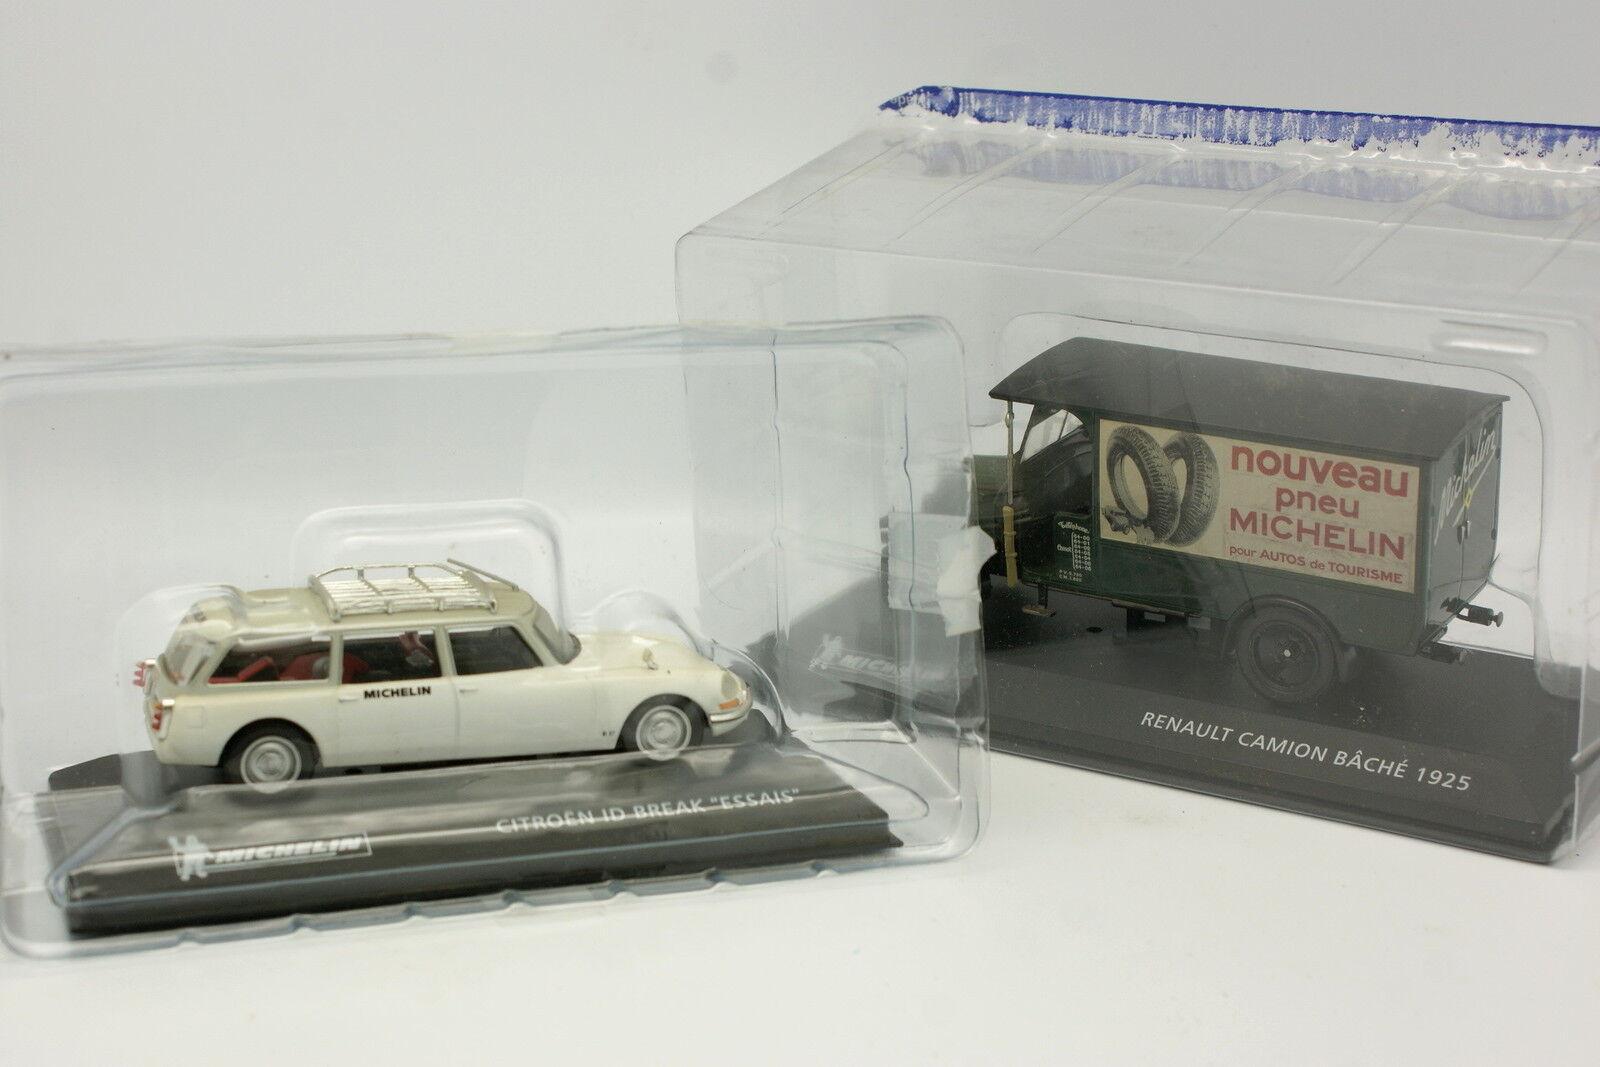 Ixo Norev Press 1 43 - Set of 2 Michelin Citroen Renault